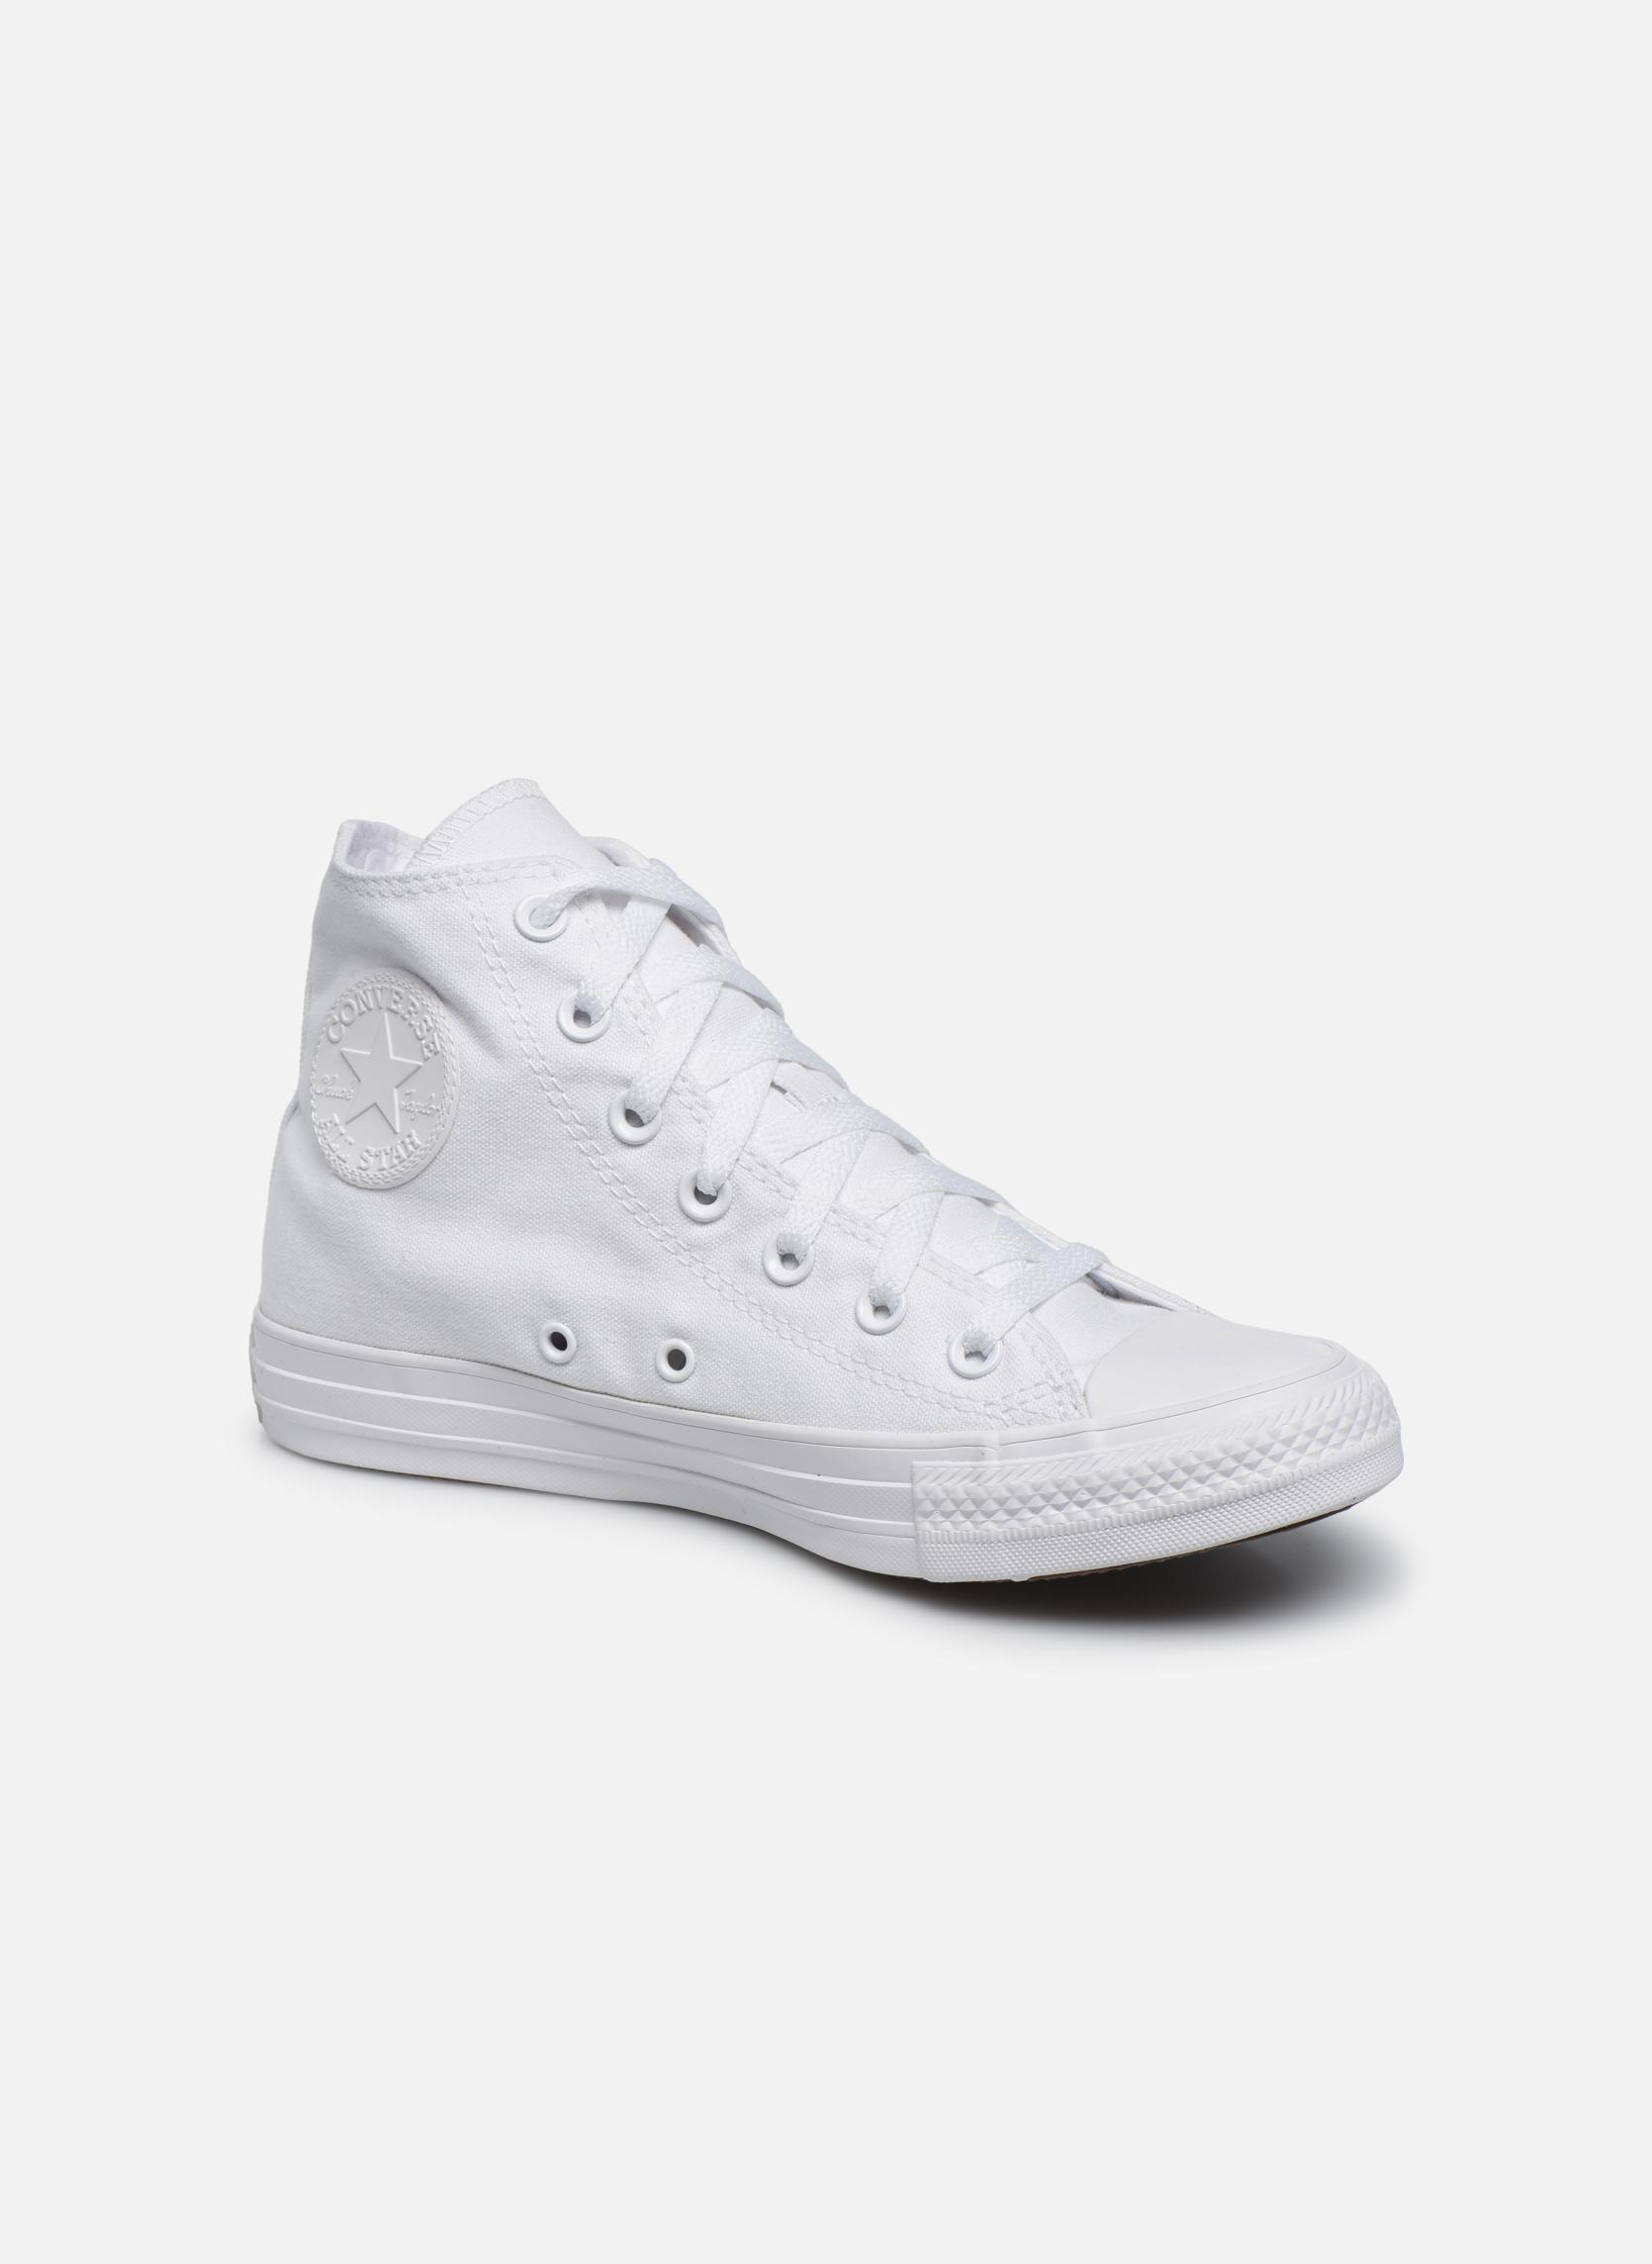 20b682493e2a Converse Chuck Taylor All Star Monochrome Canvas Hi W (White ...